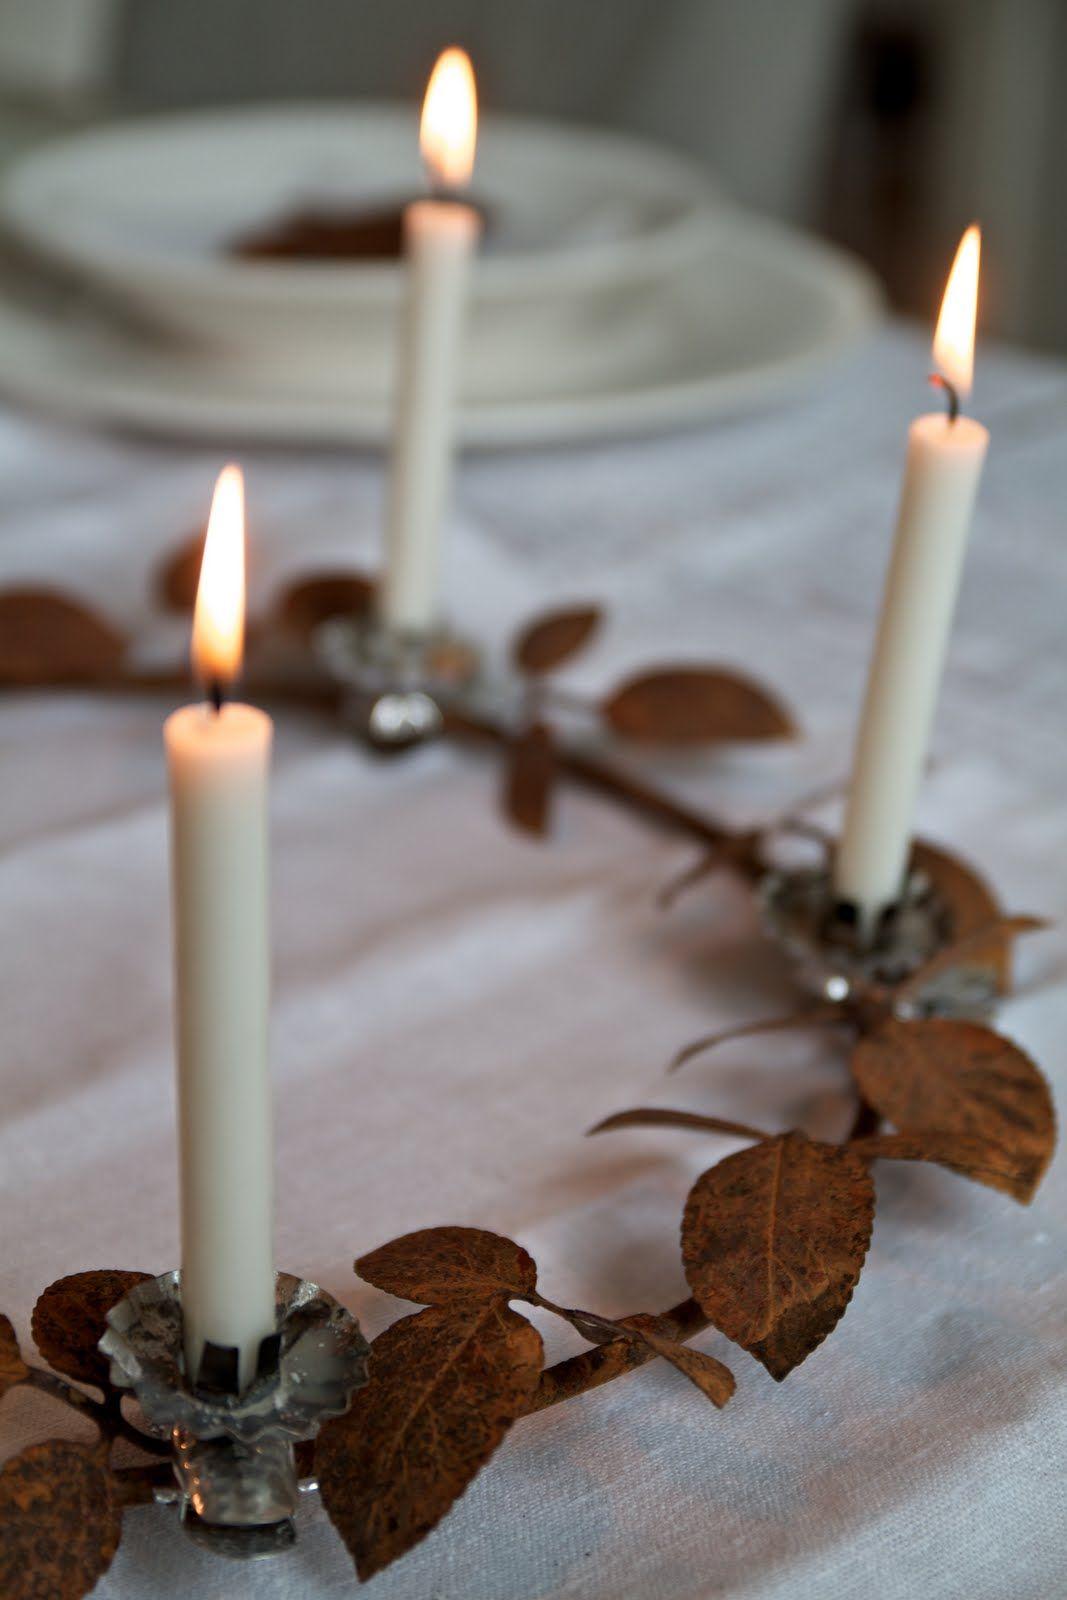 ☀ sinos e luzes - Wreath candle holder.